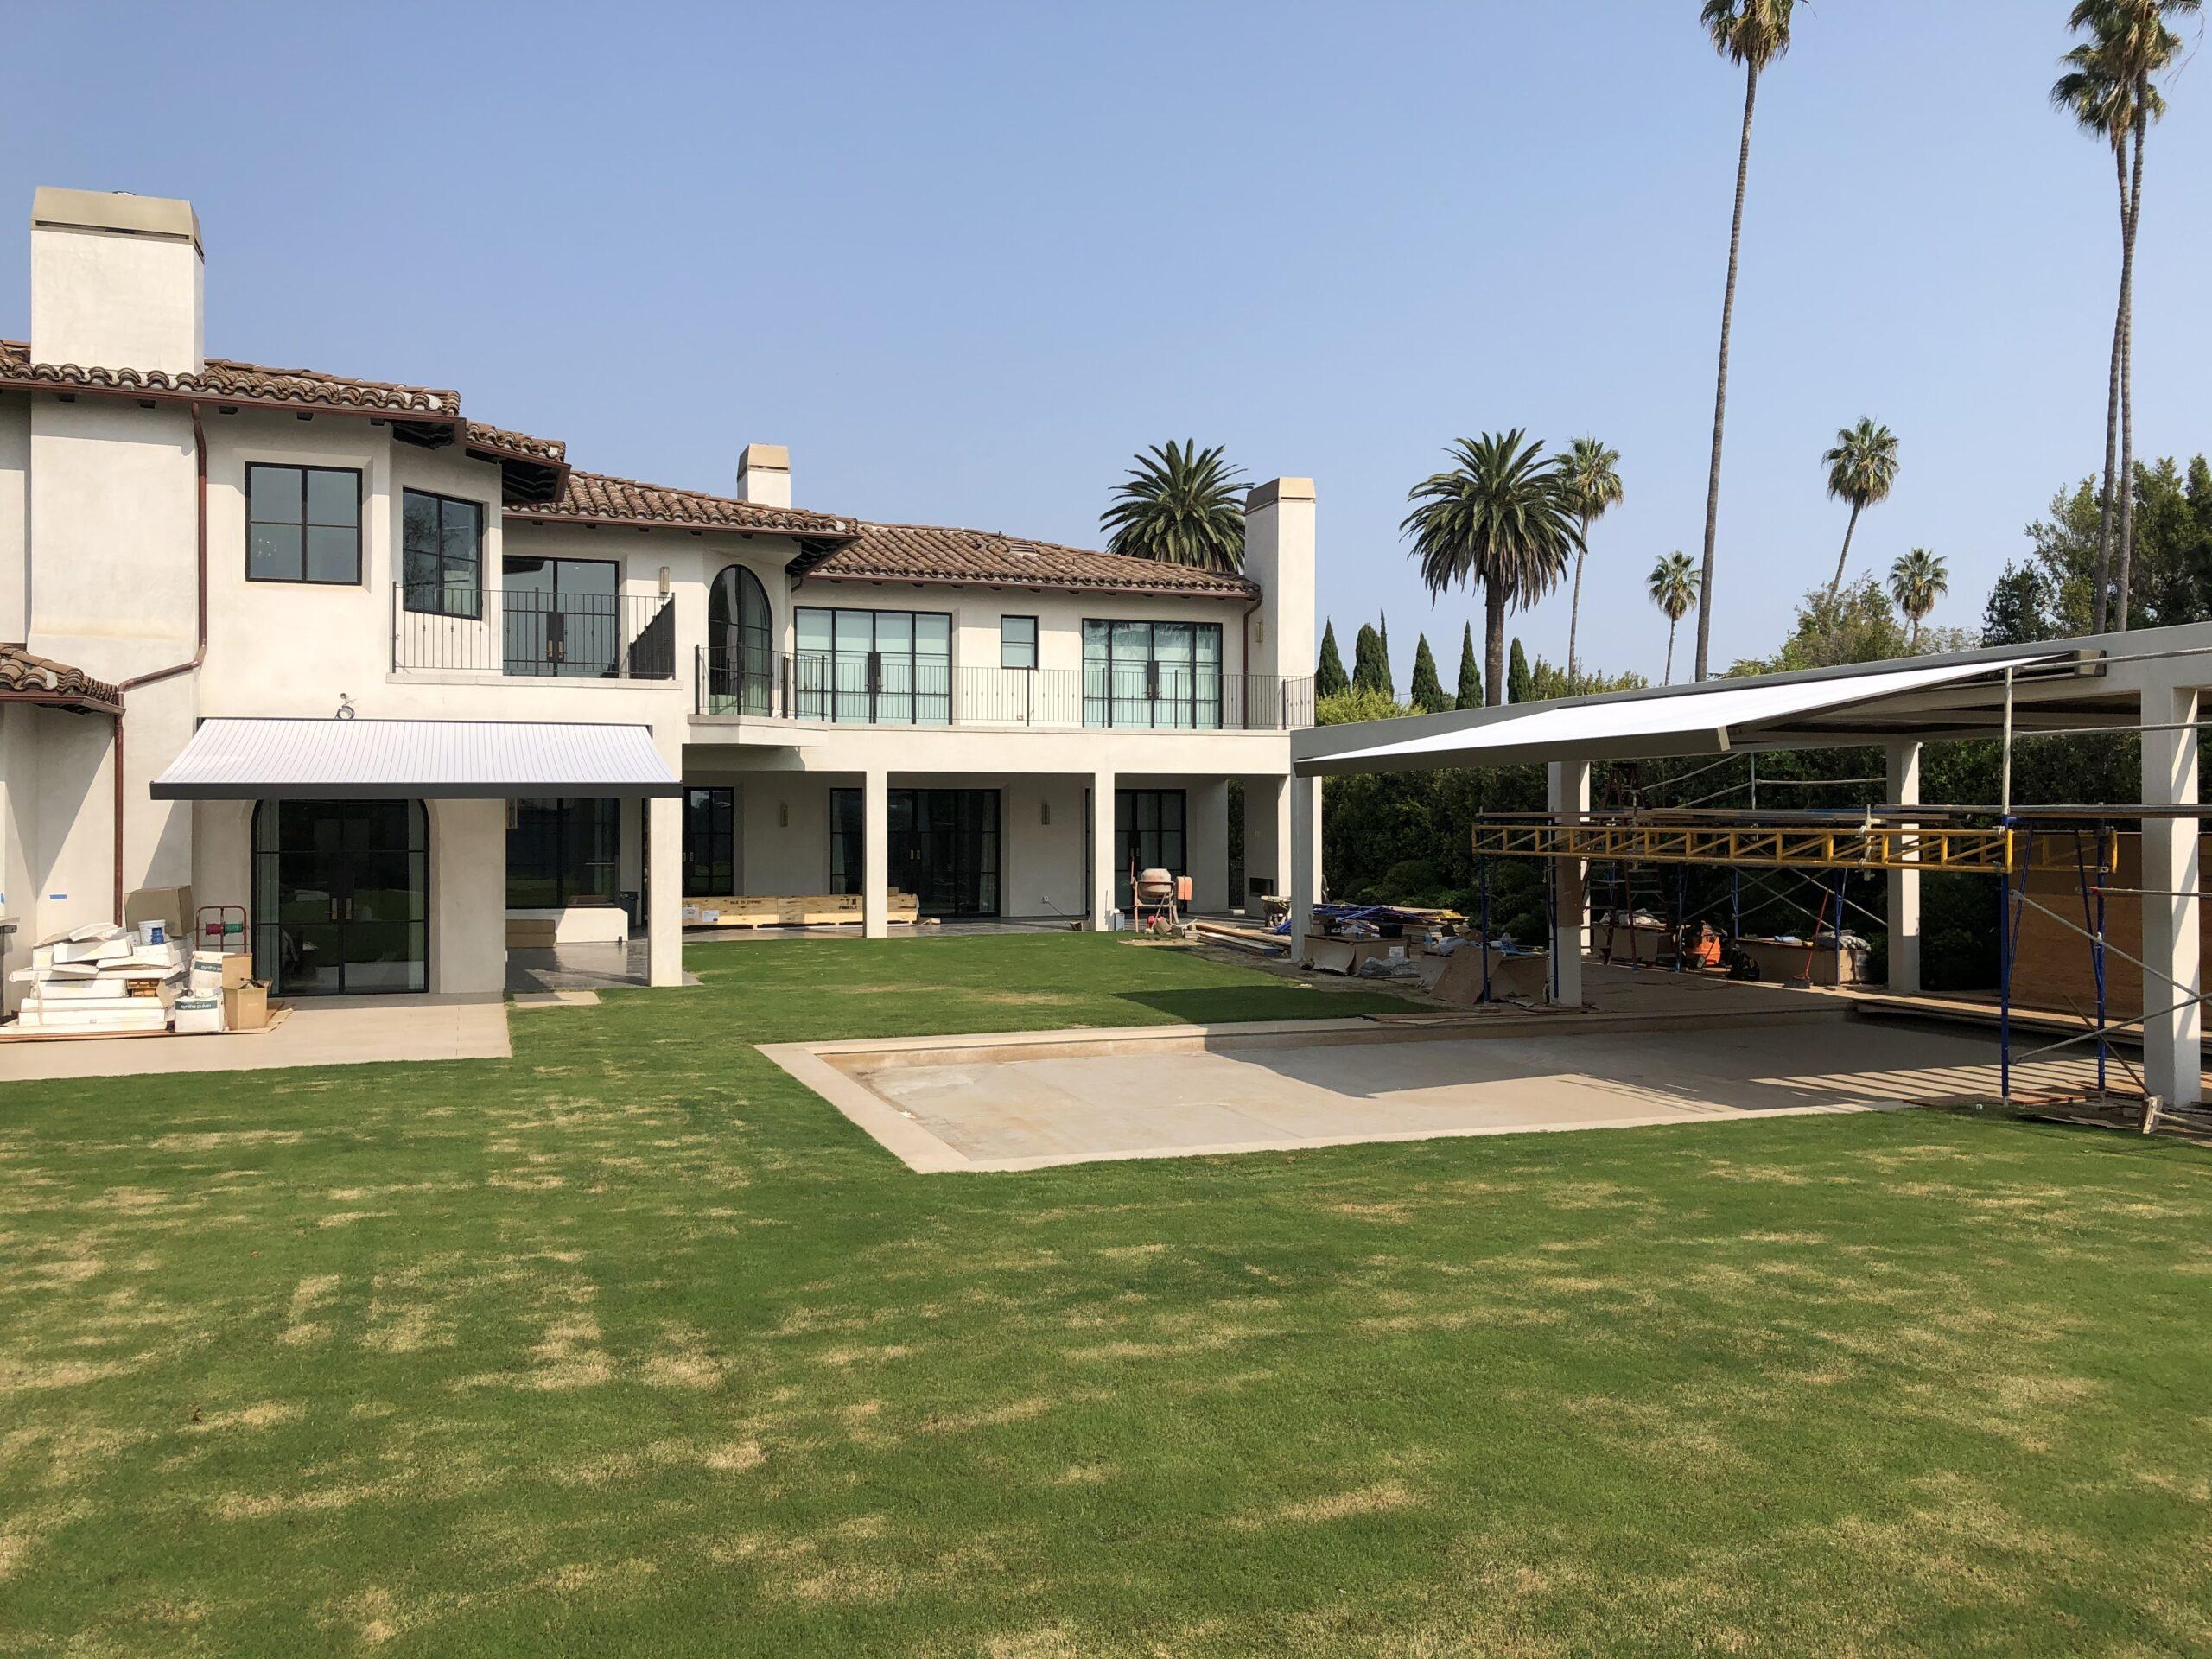 Villa Rockingham - WAREMA K70 and Large slat louvers installed